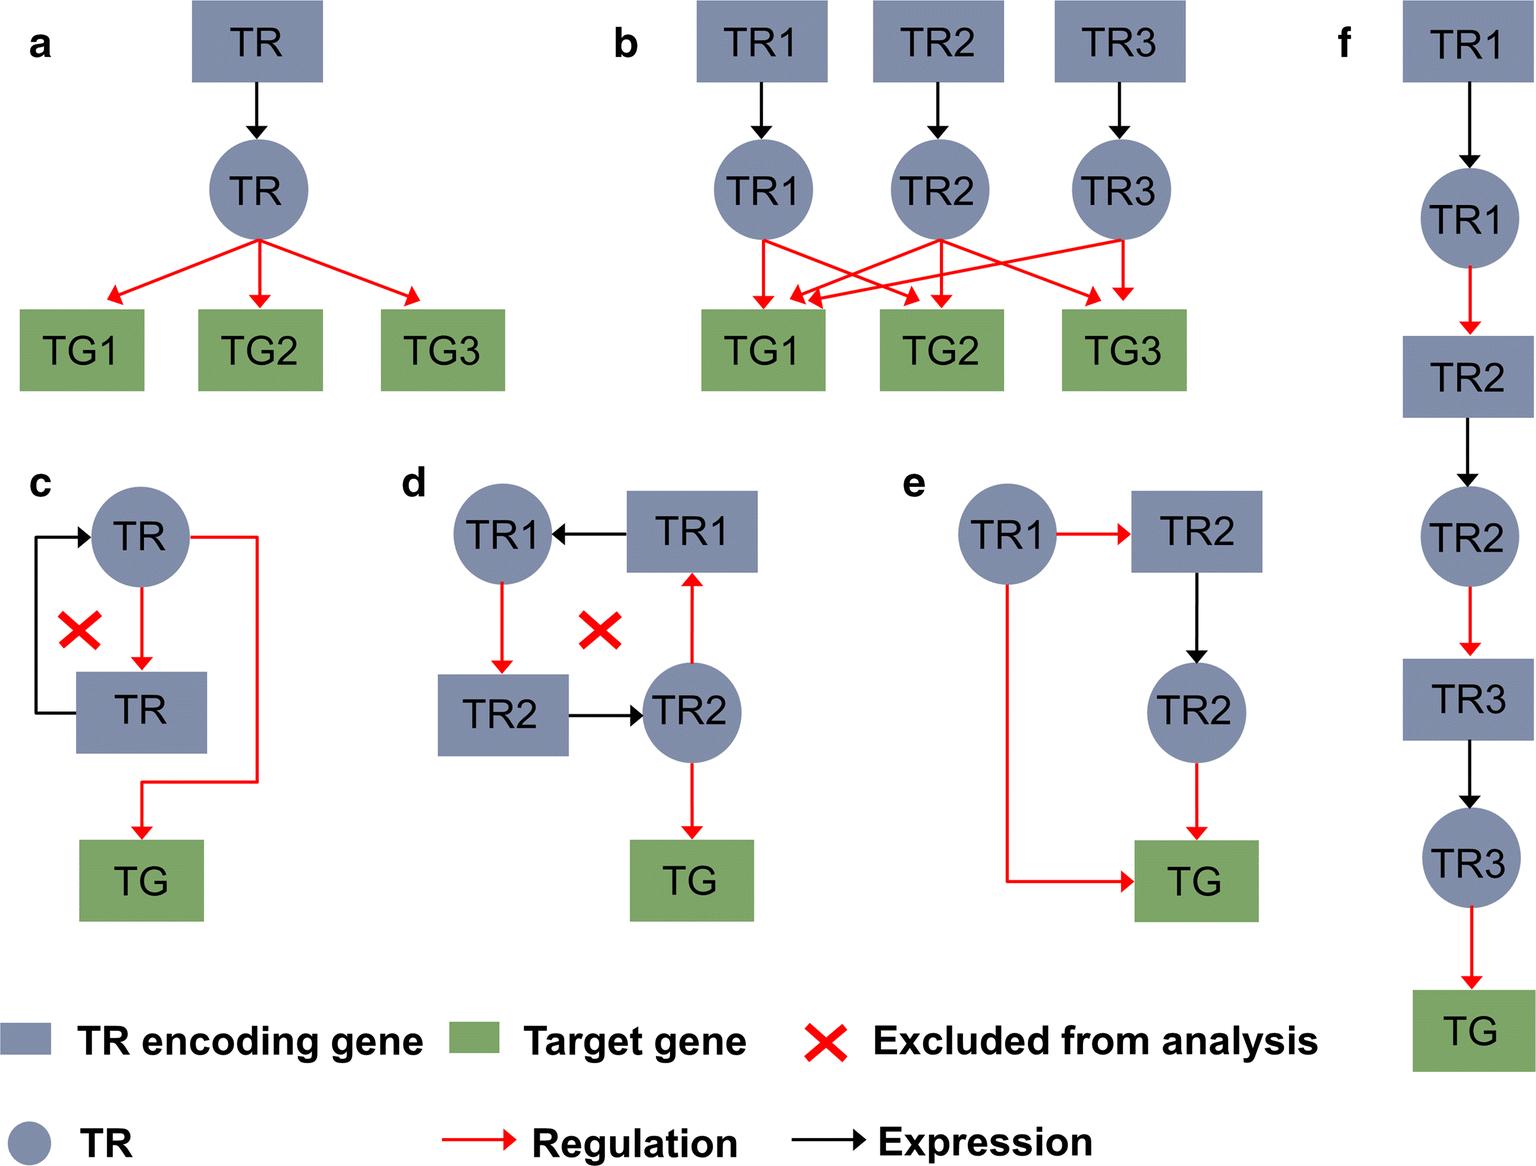 In silico model-guided identification of transcriptional regulator